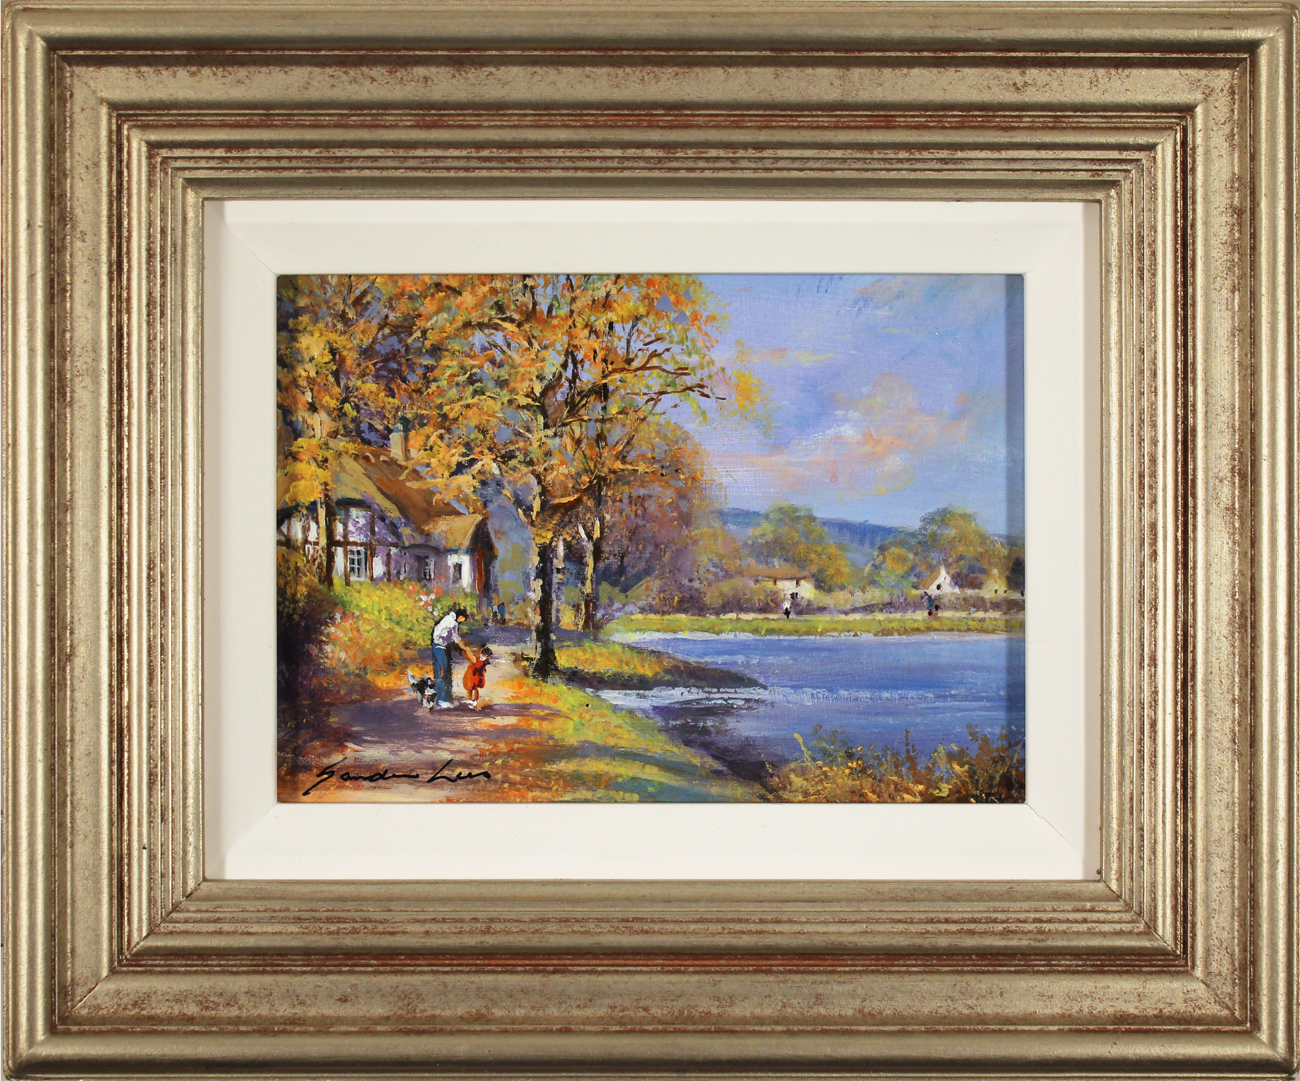 Gordon Lees, Original oil painting on panel, Autumn Lake Click to enlarge